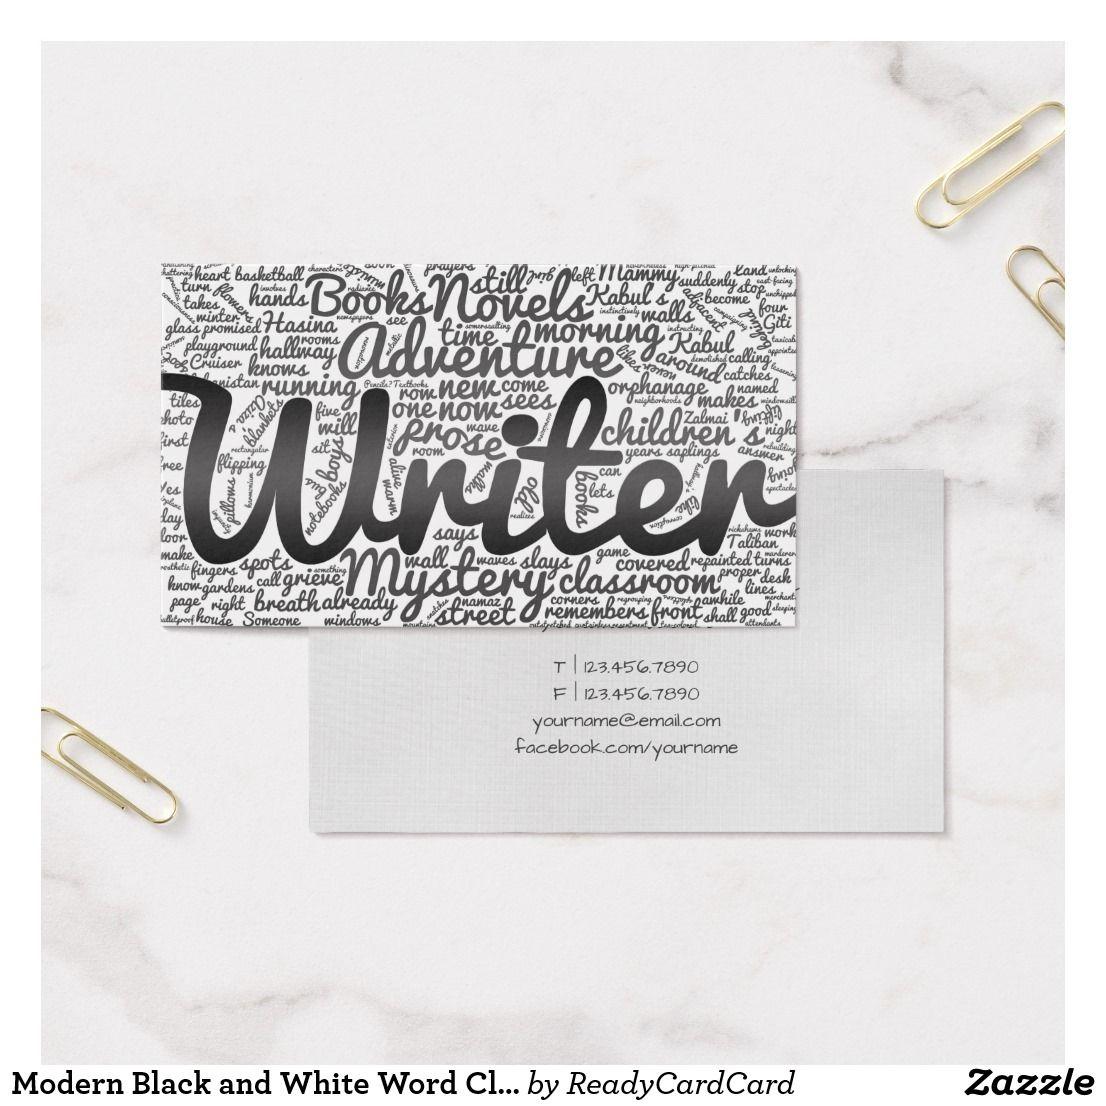 Modern black and white word cloud writers authors business card modern black and white word cloud writers authors business card reheart Choice Image